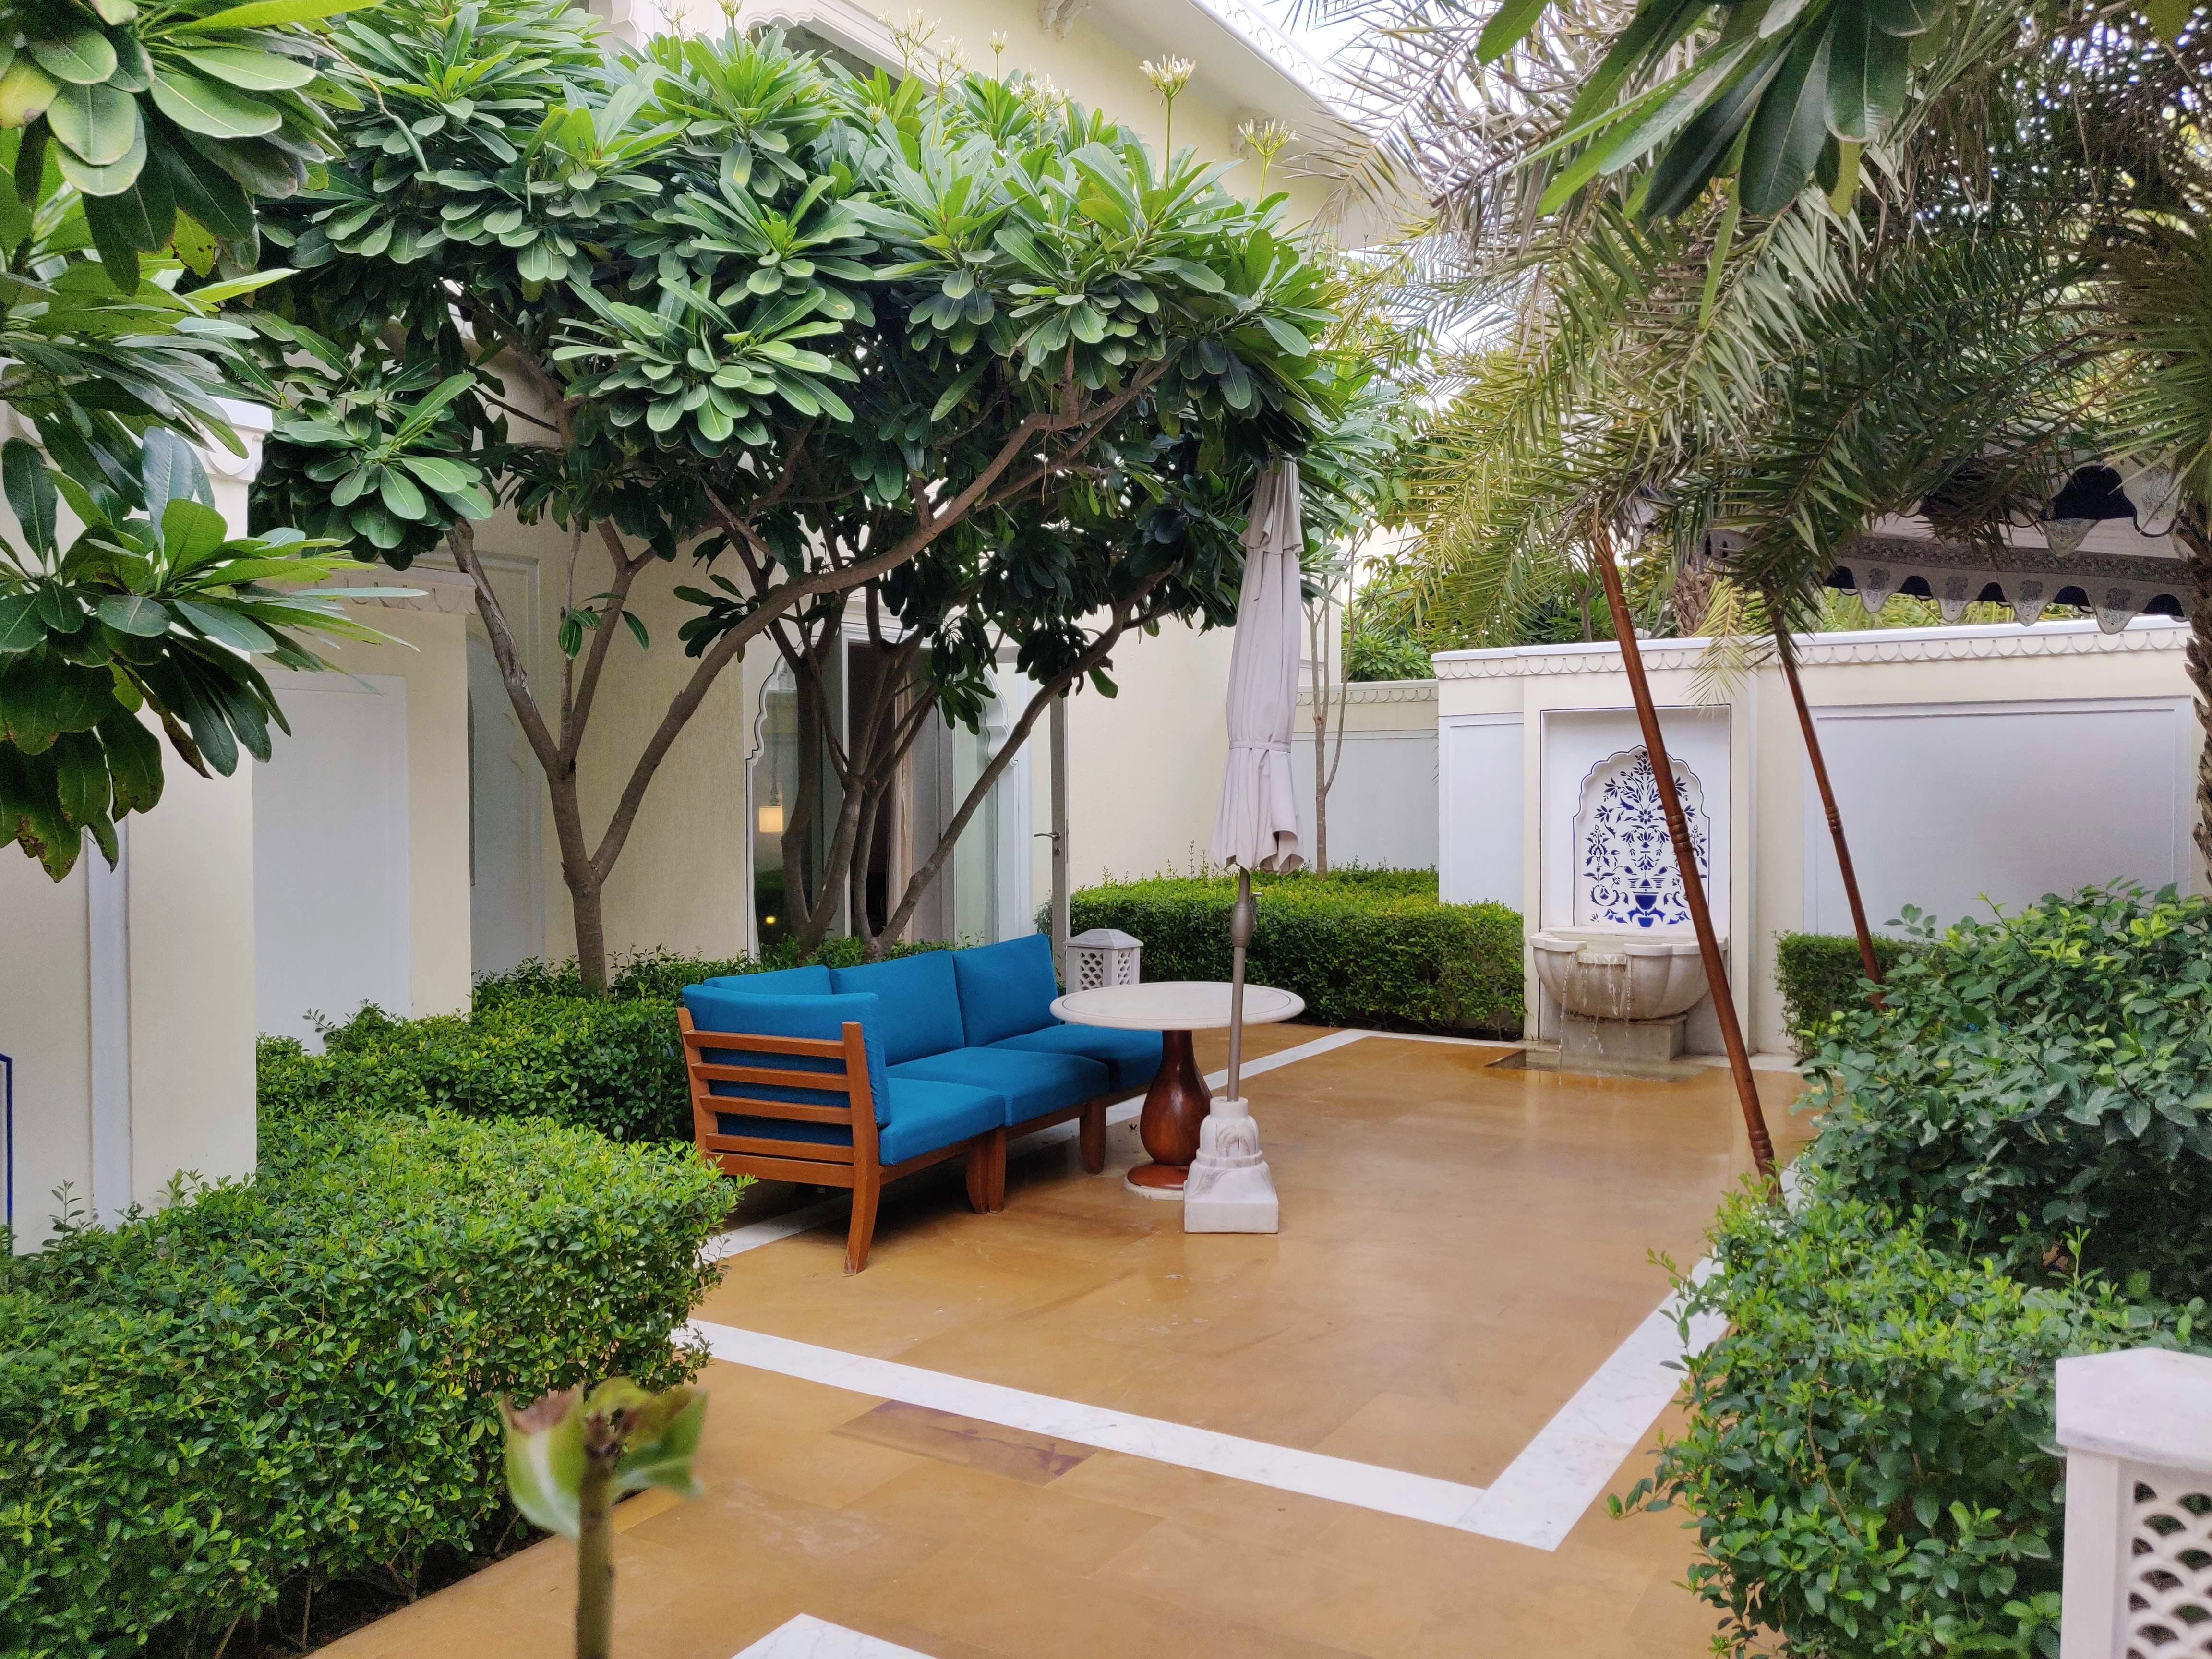 Property,Backyard,Courtyard,Building,Real estate,House,Yard,Tree,Room,Garden